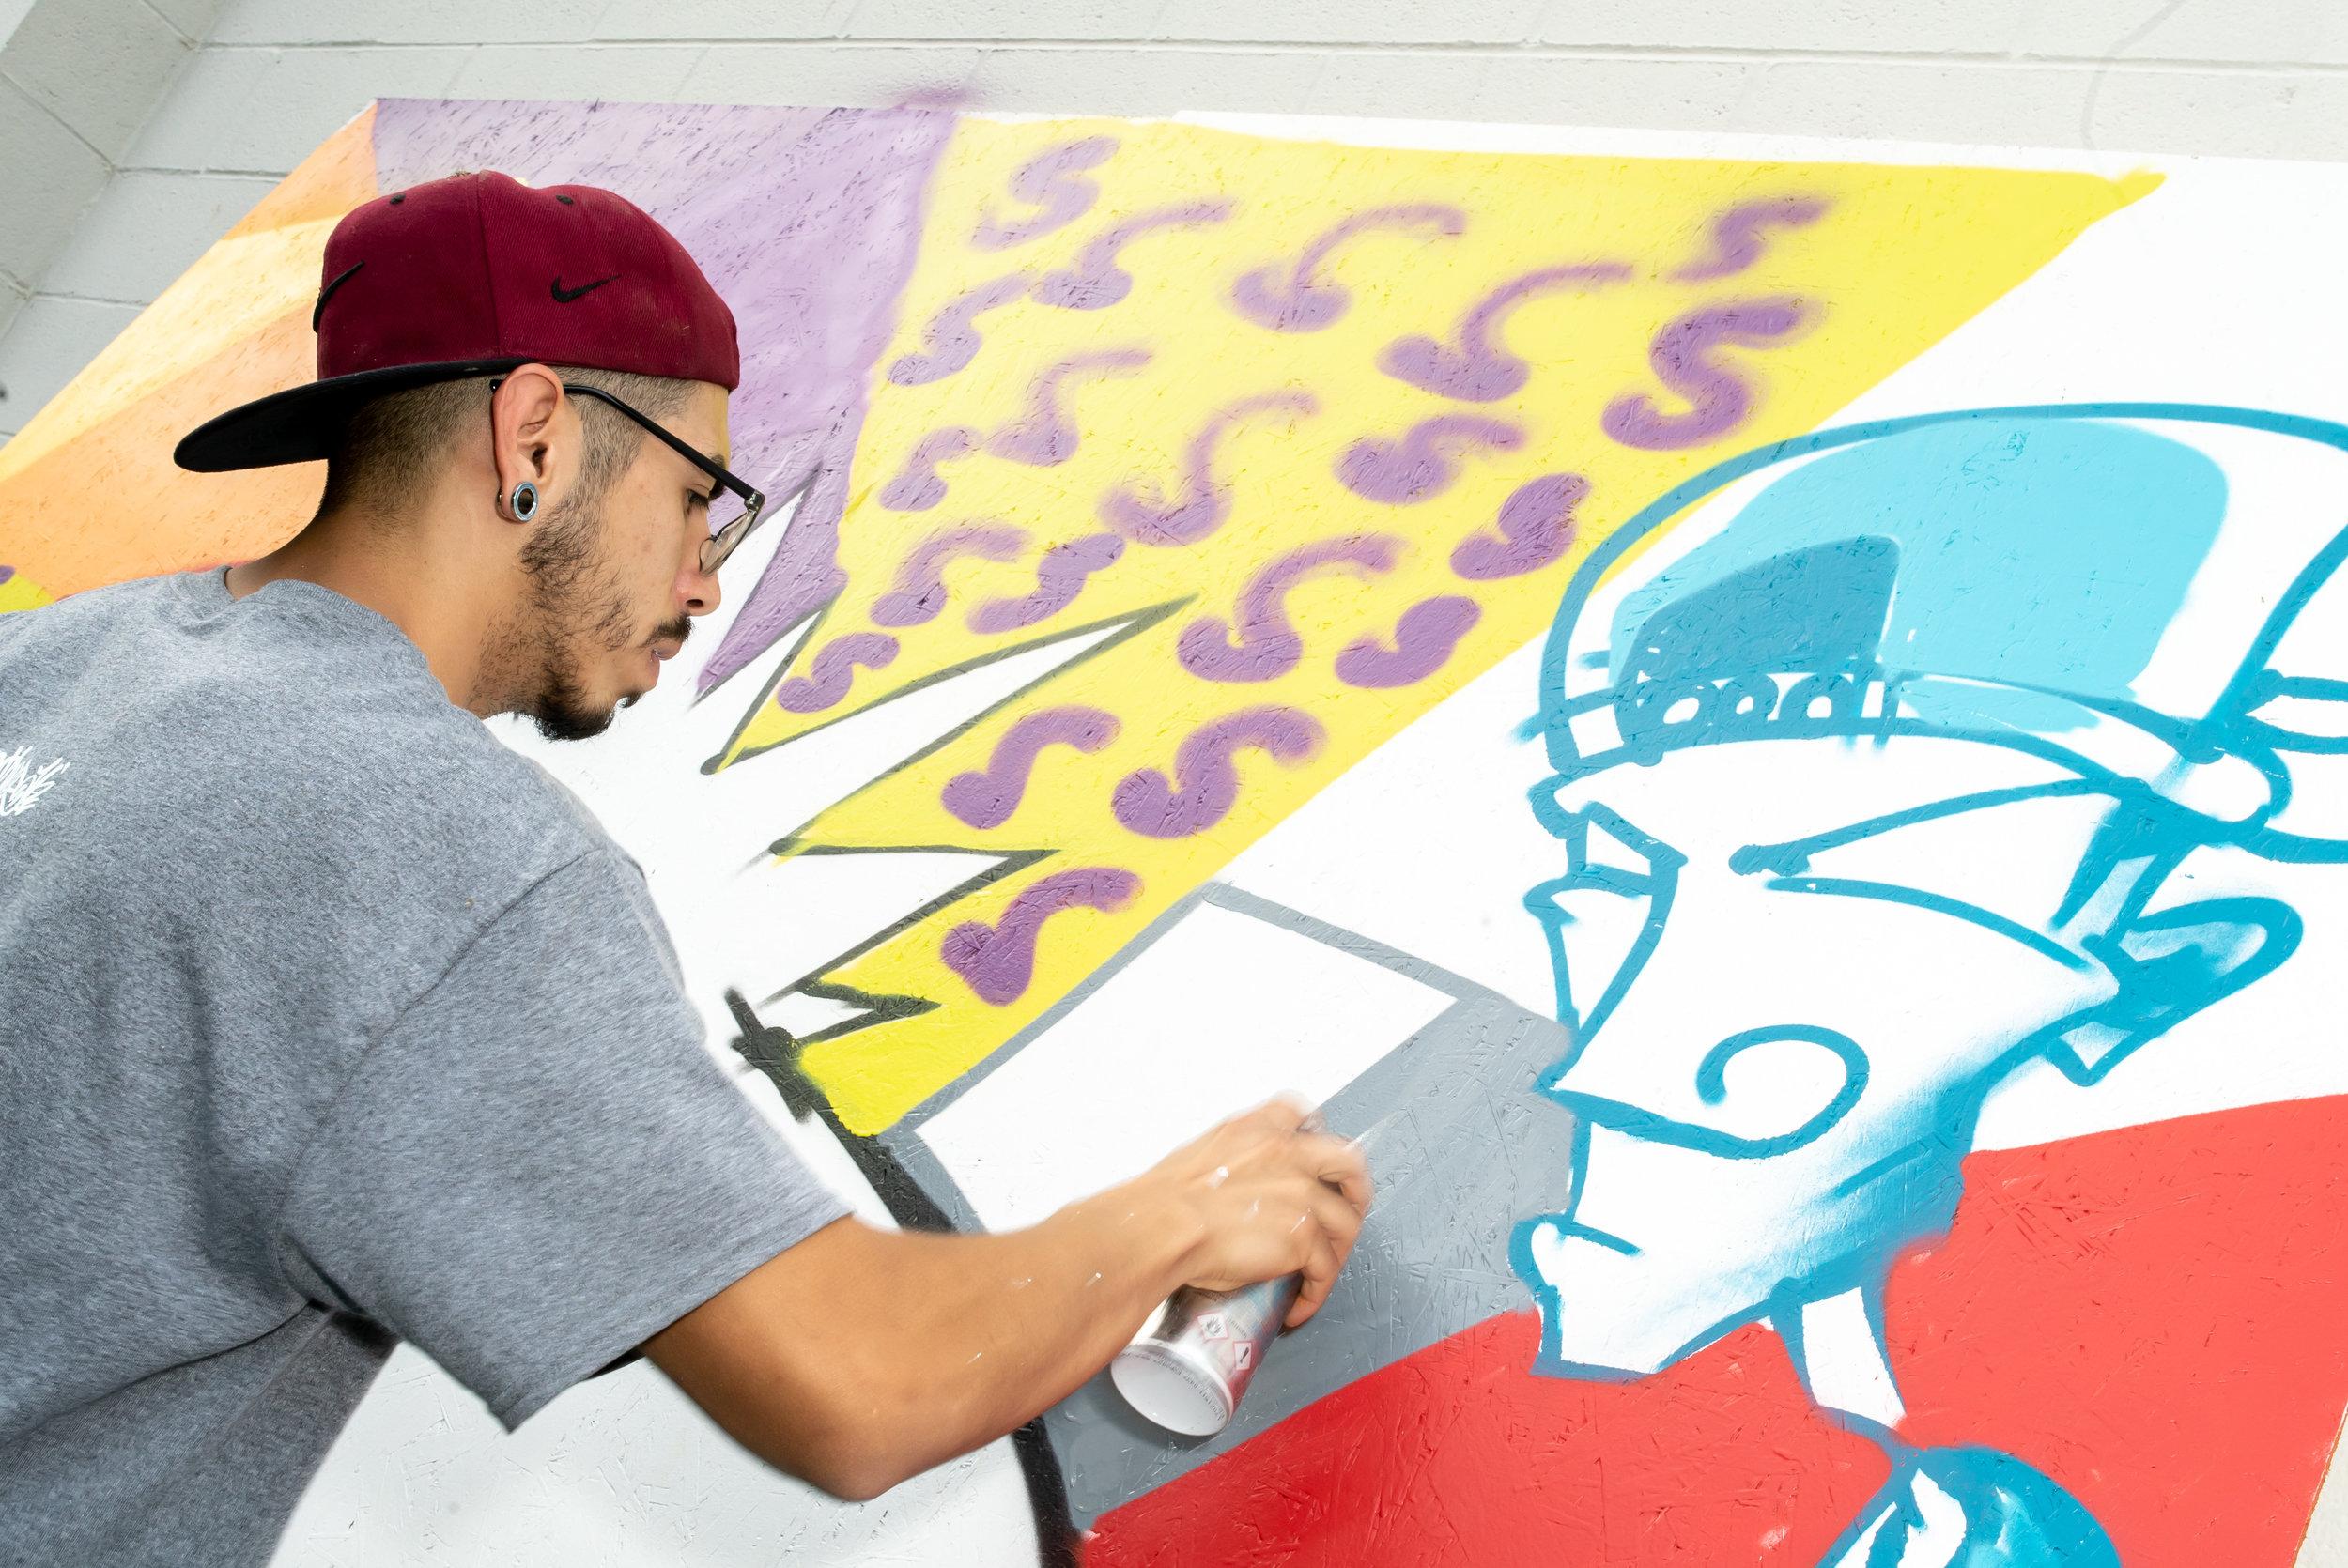 Volunteer graffiti artist, Reggie, creating a live piece.